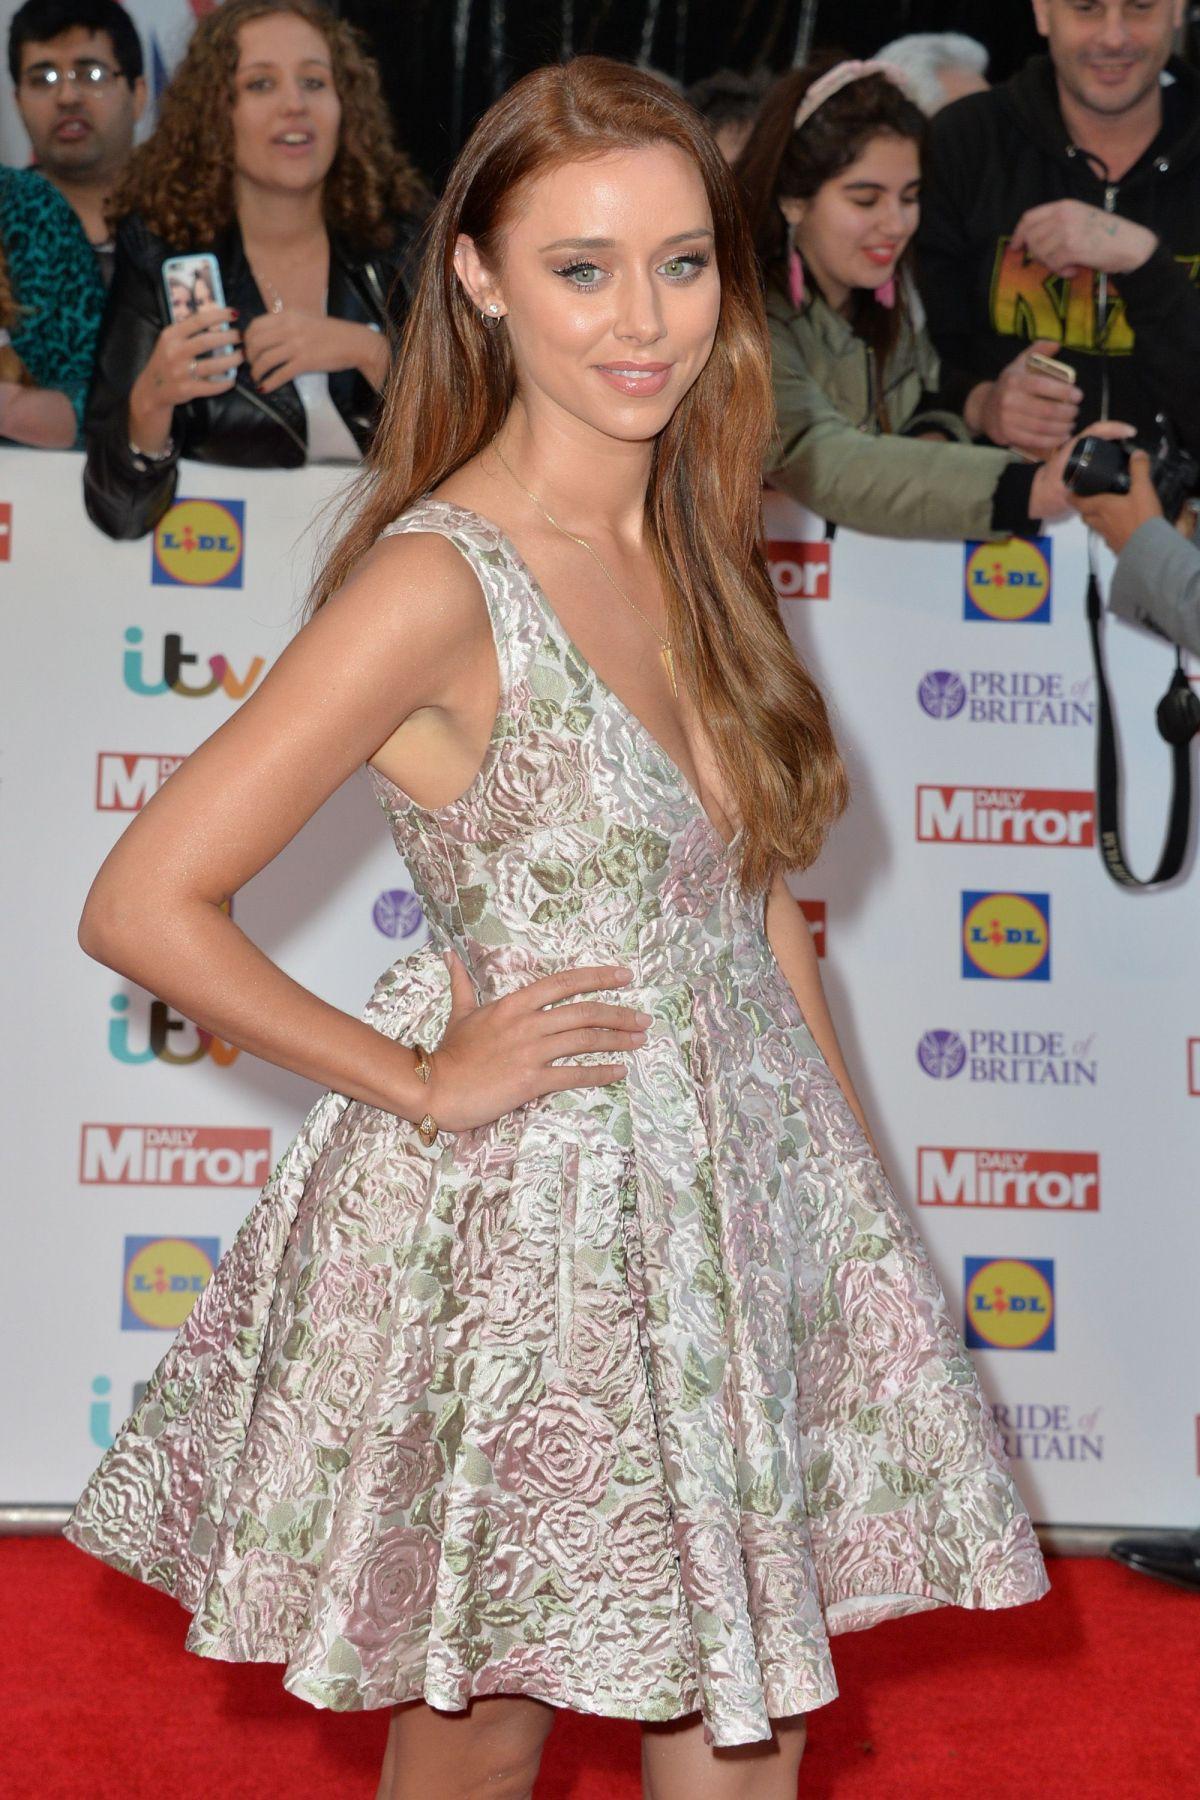 UNA FODEN at Pride of Britain Awards 2015 in London 09/28/2015